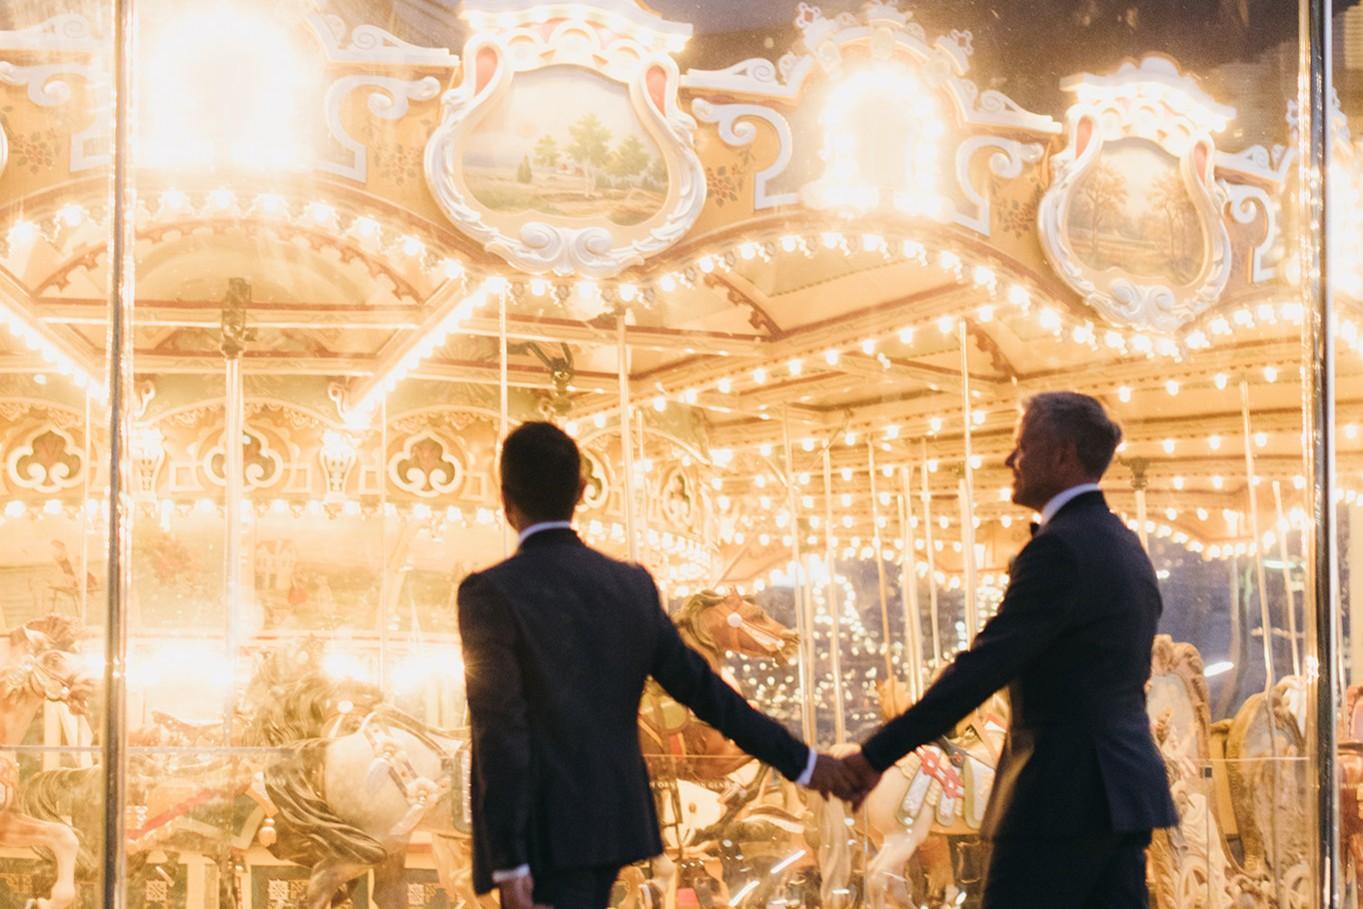 H & H Weddings - DAN & ATINÇ: A Jane's Carousel Wedding